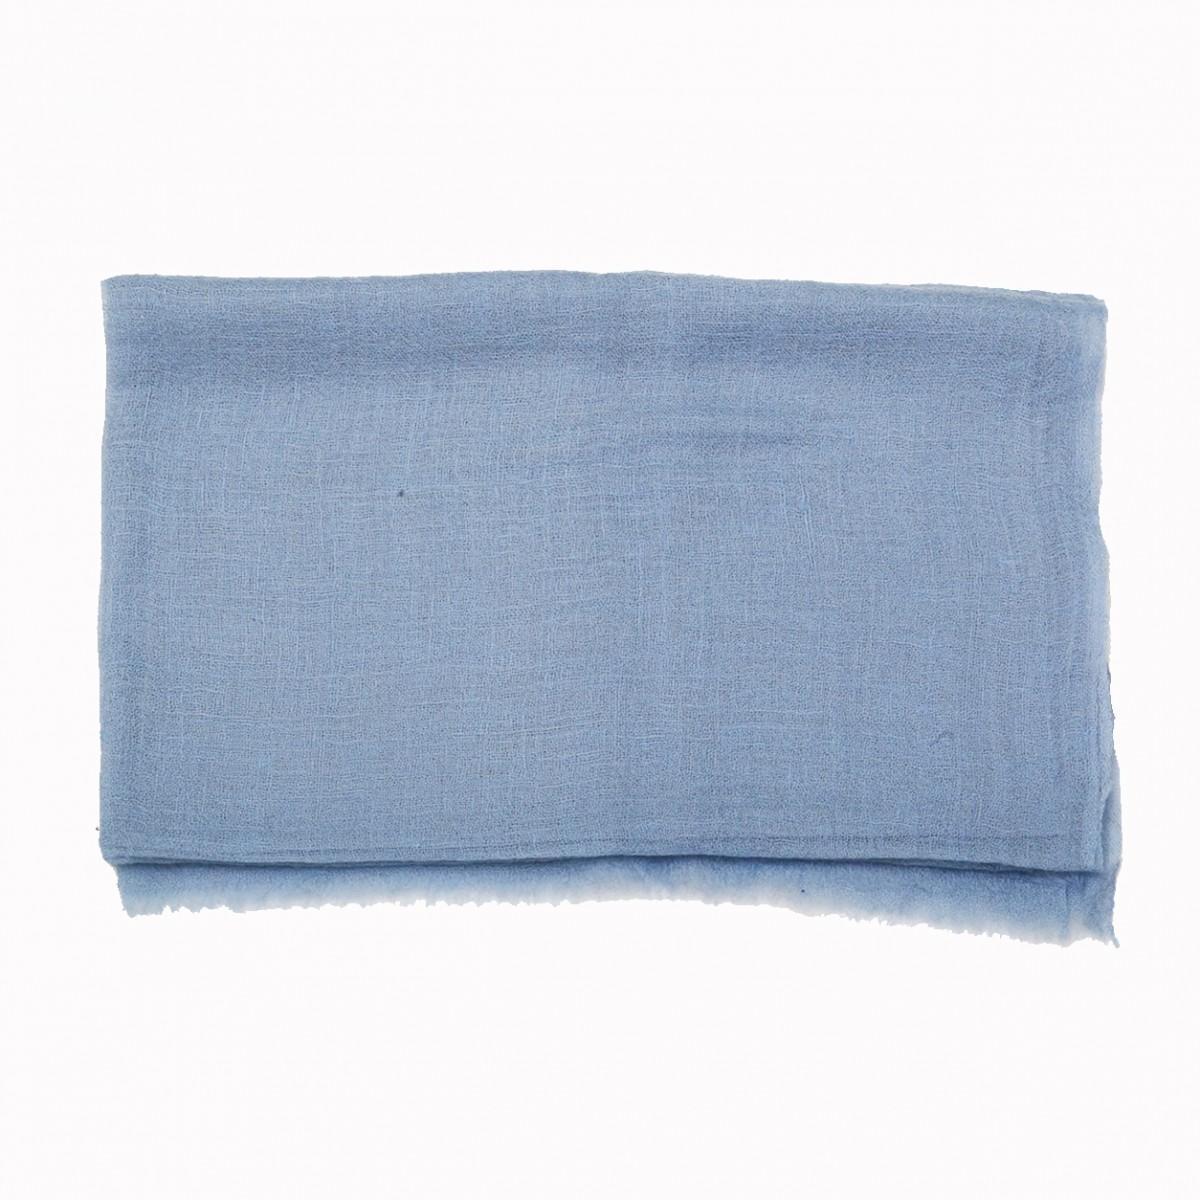 Sheer Pashmina Scarf - Serenity Blue